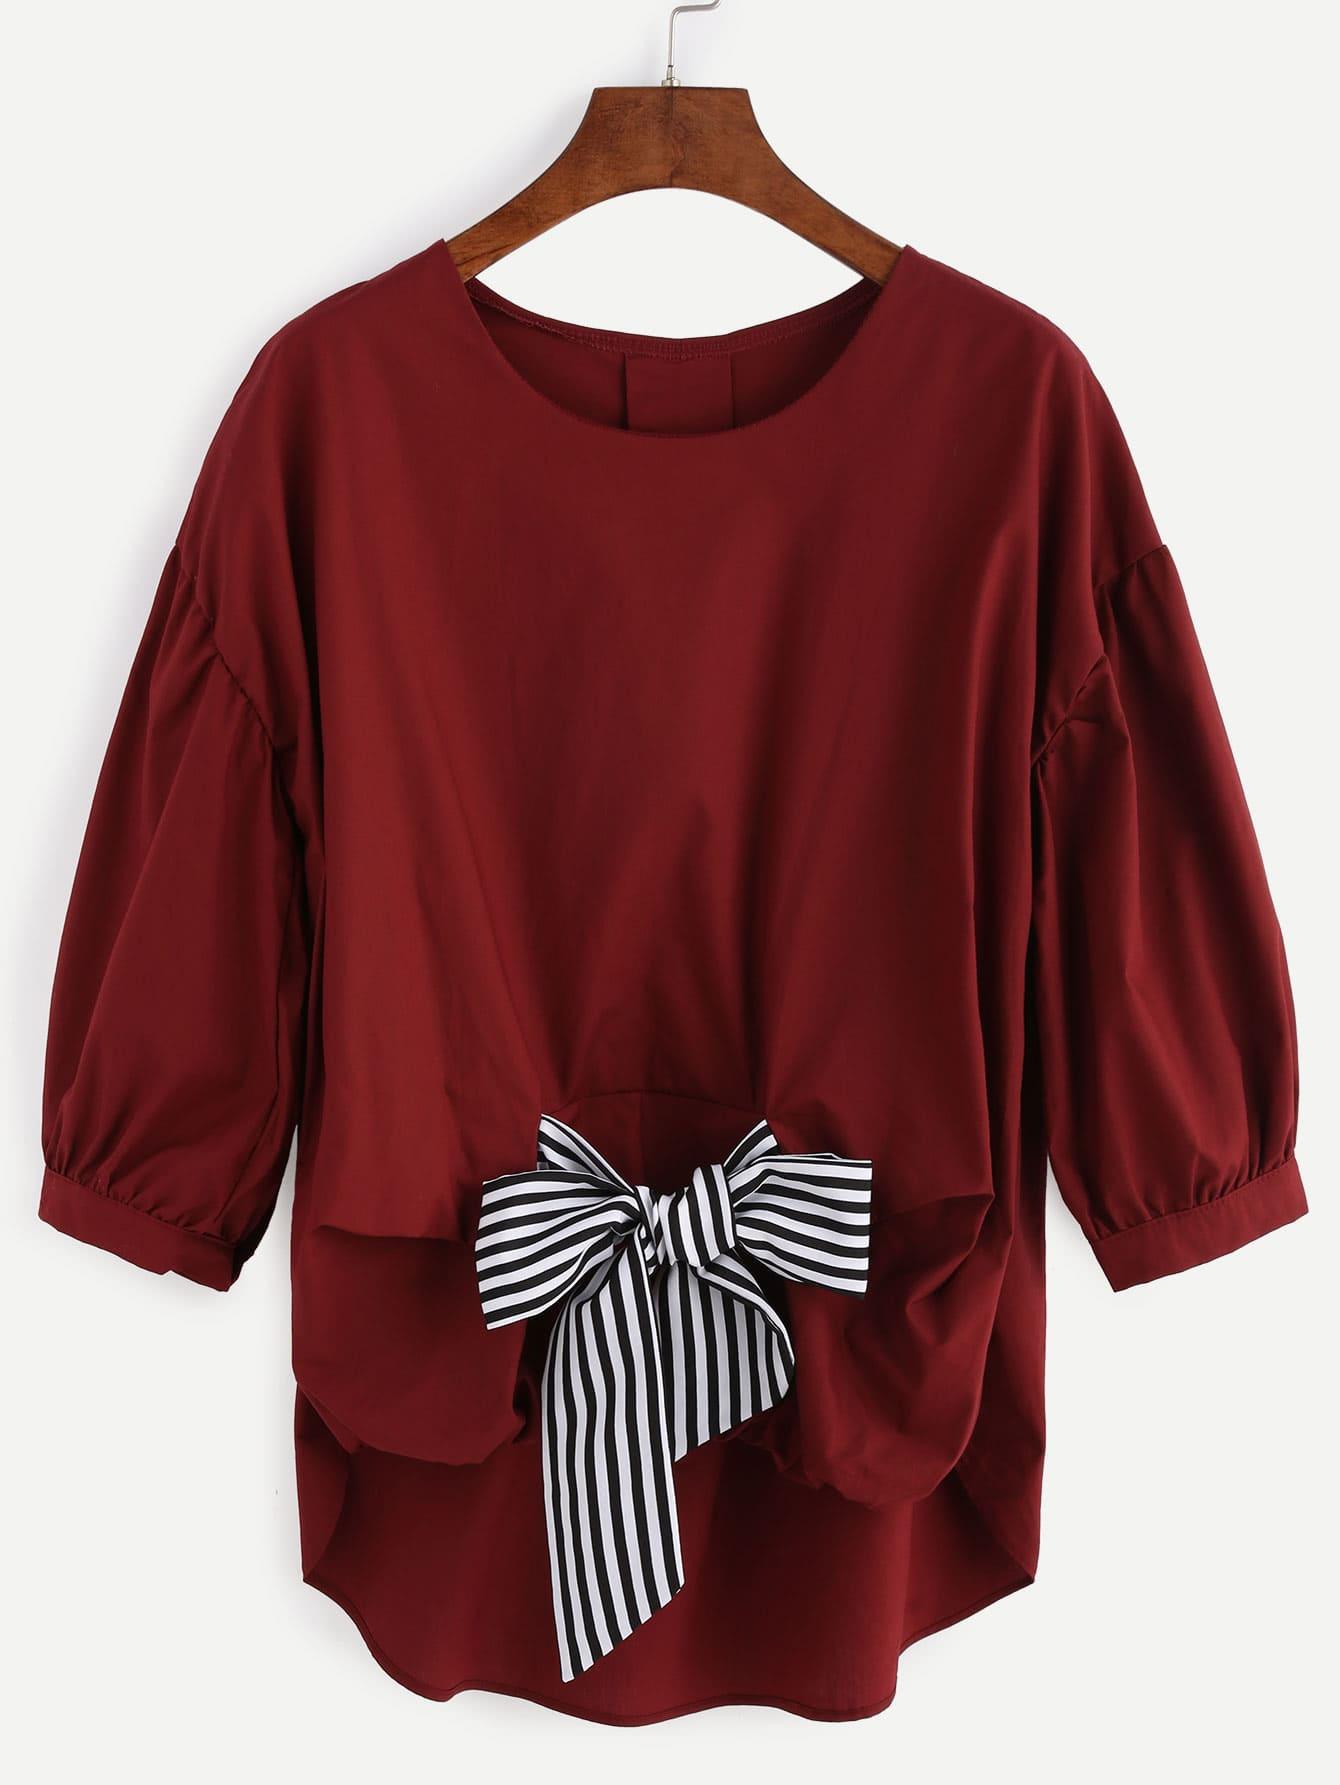 blouse160805108_2